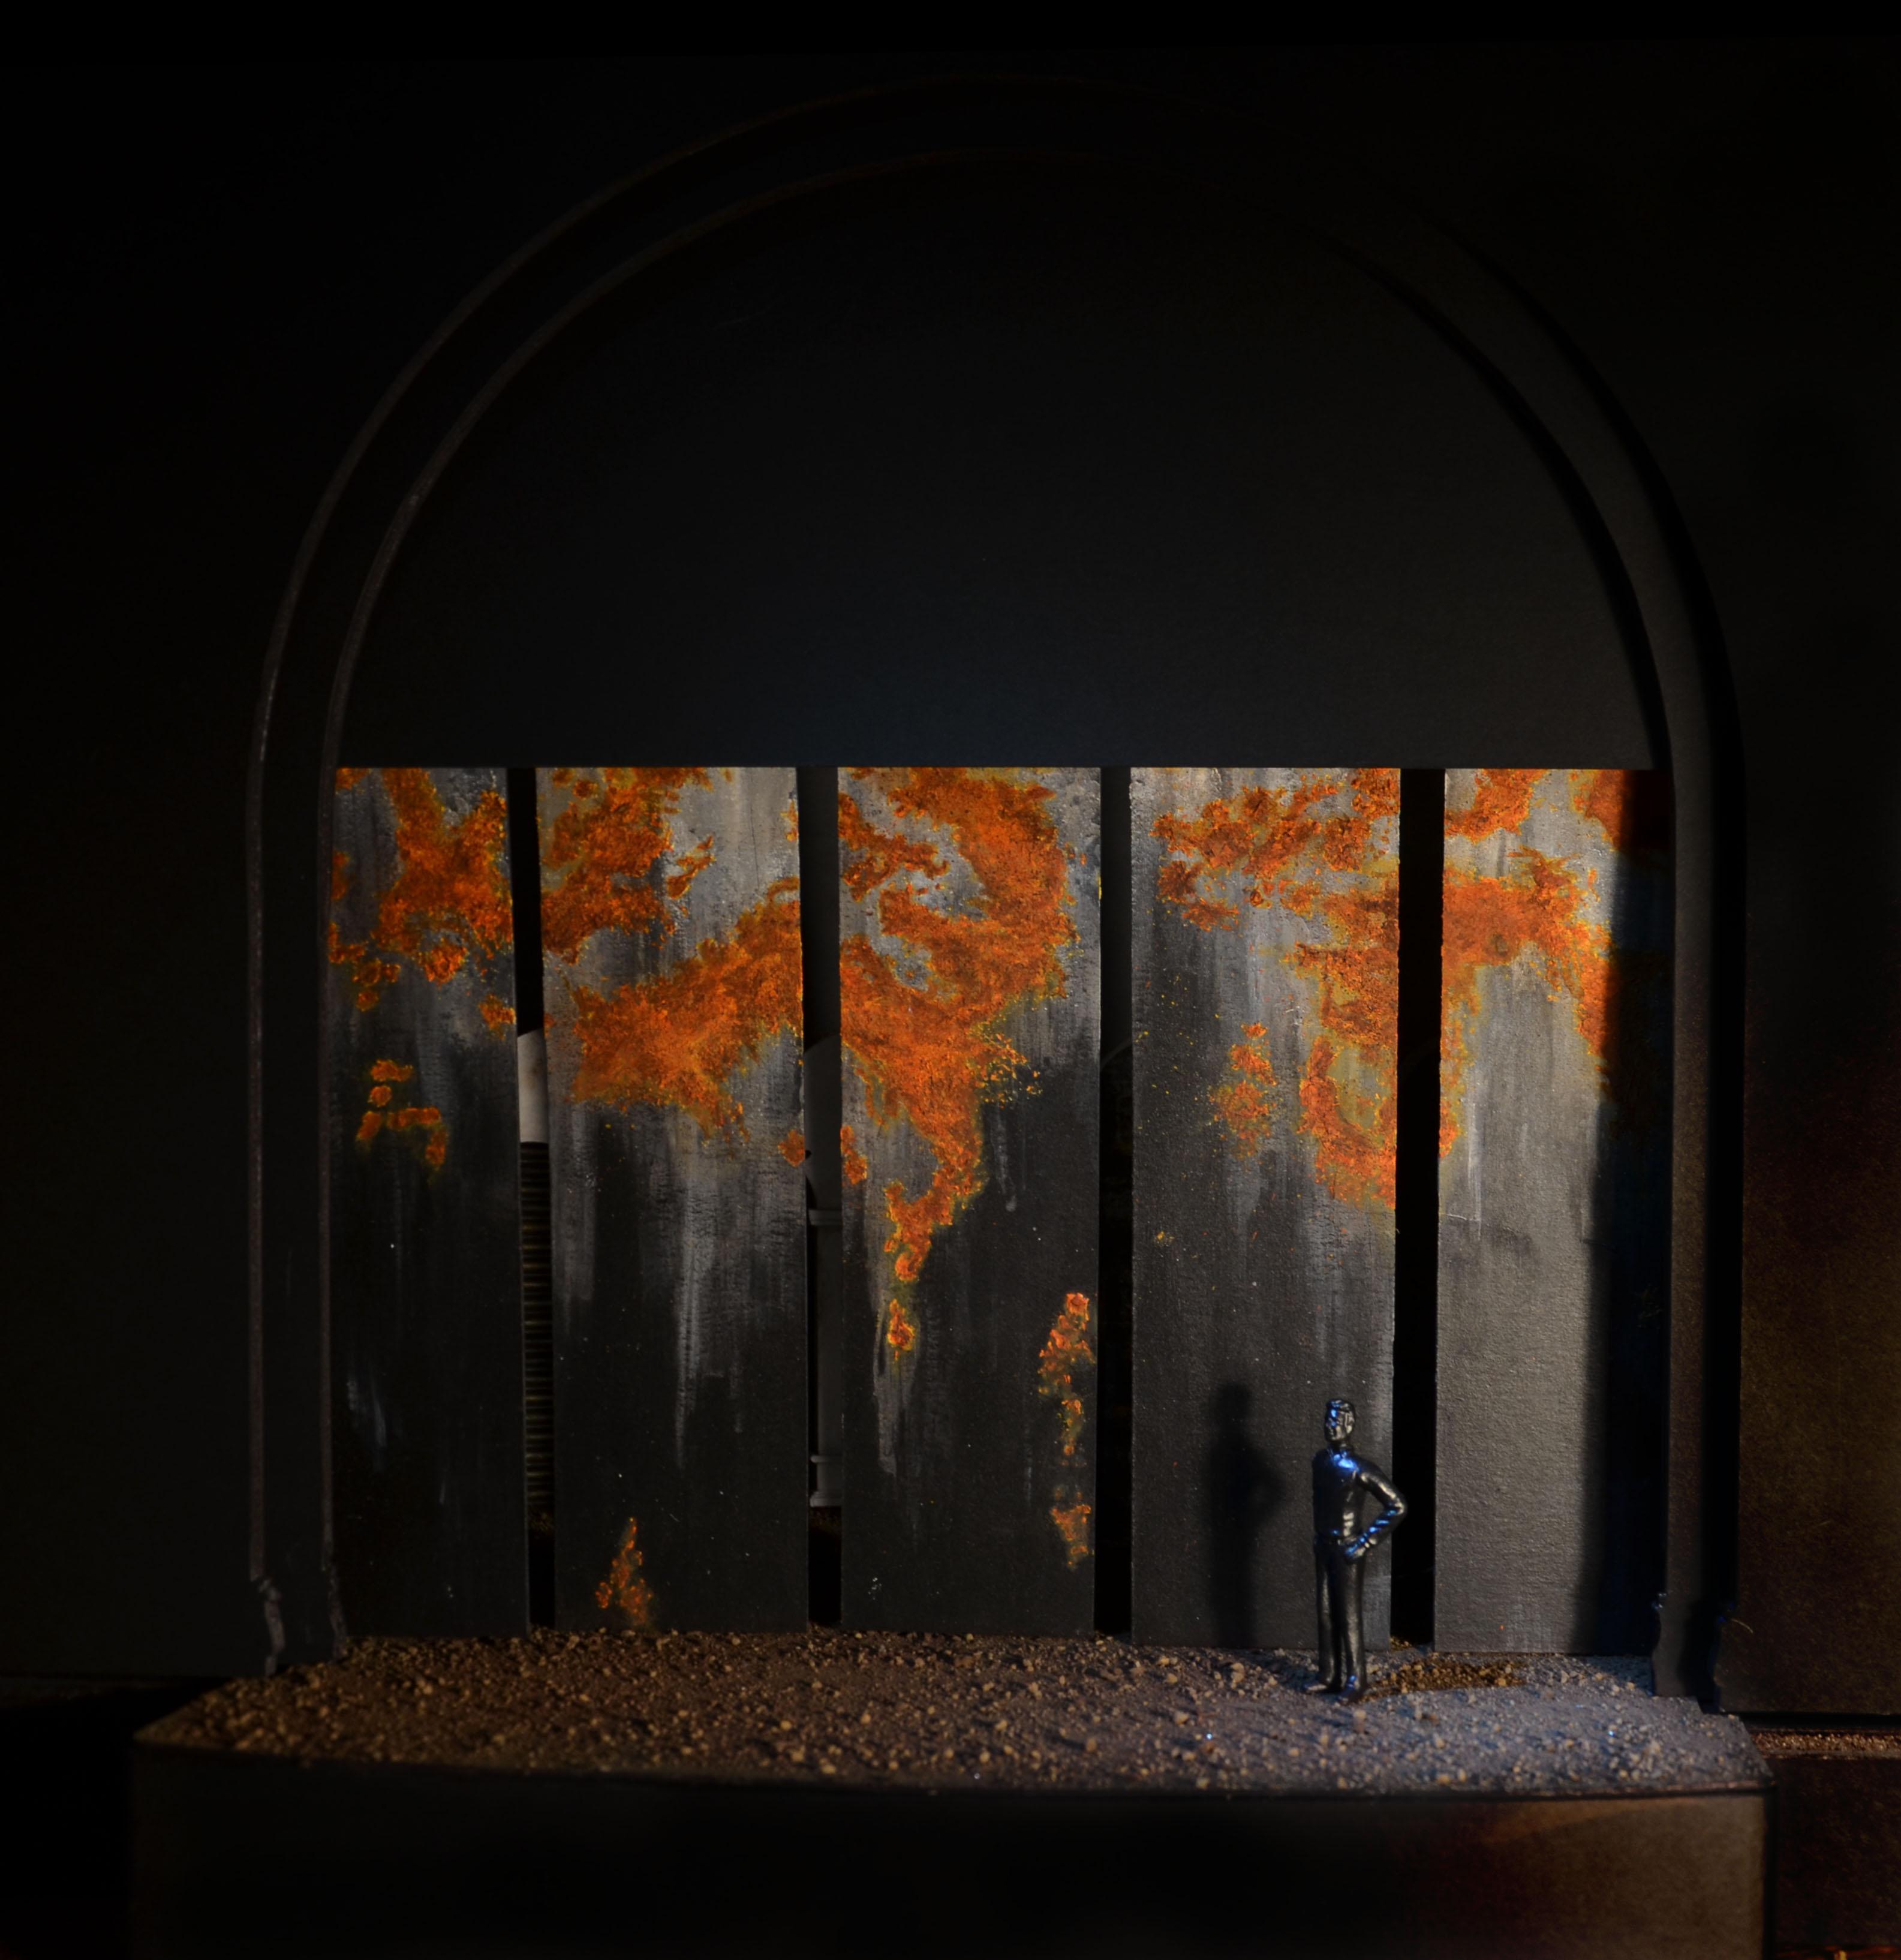 'Macbeth' - Final shutters